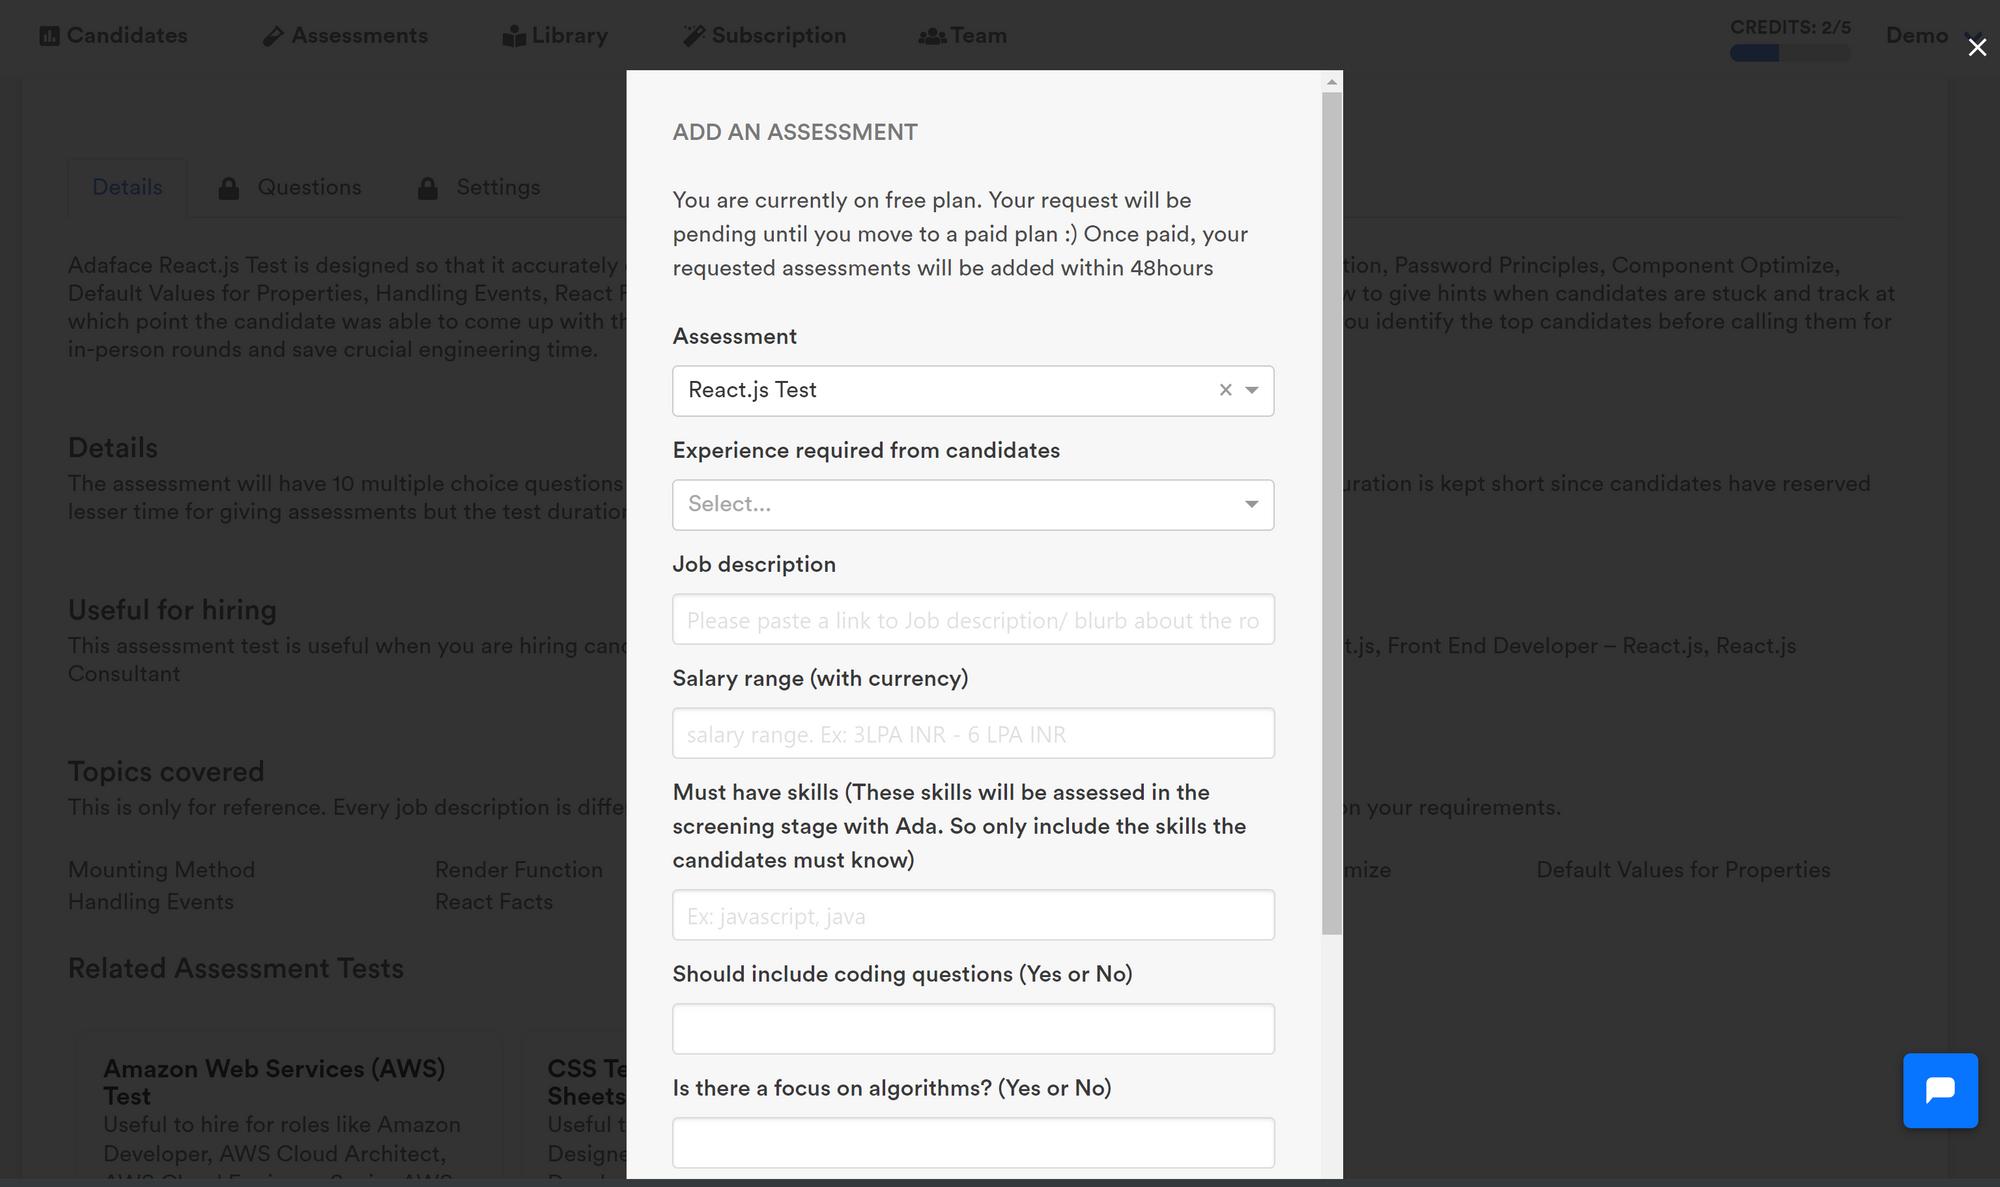 Requesting a custom assessment image